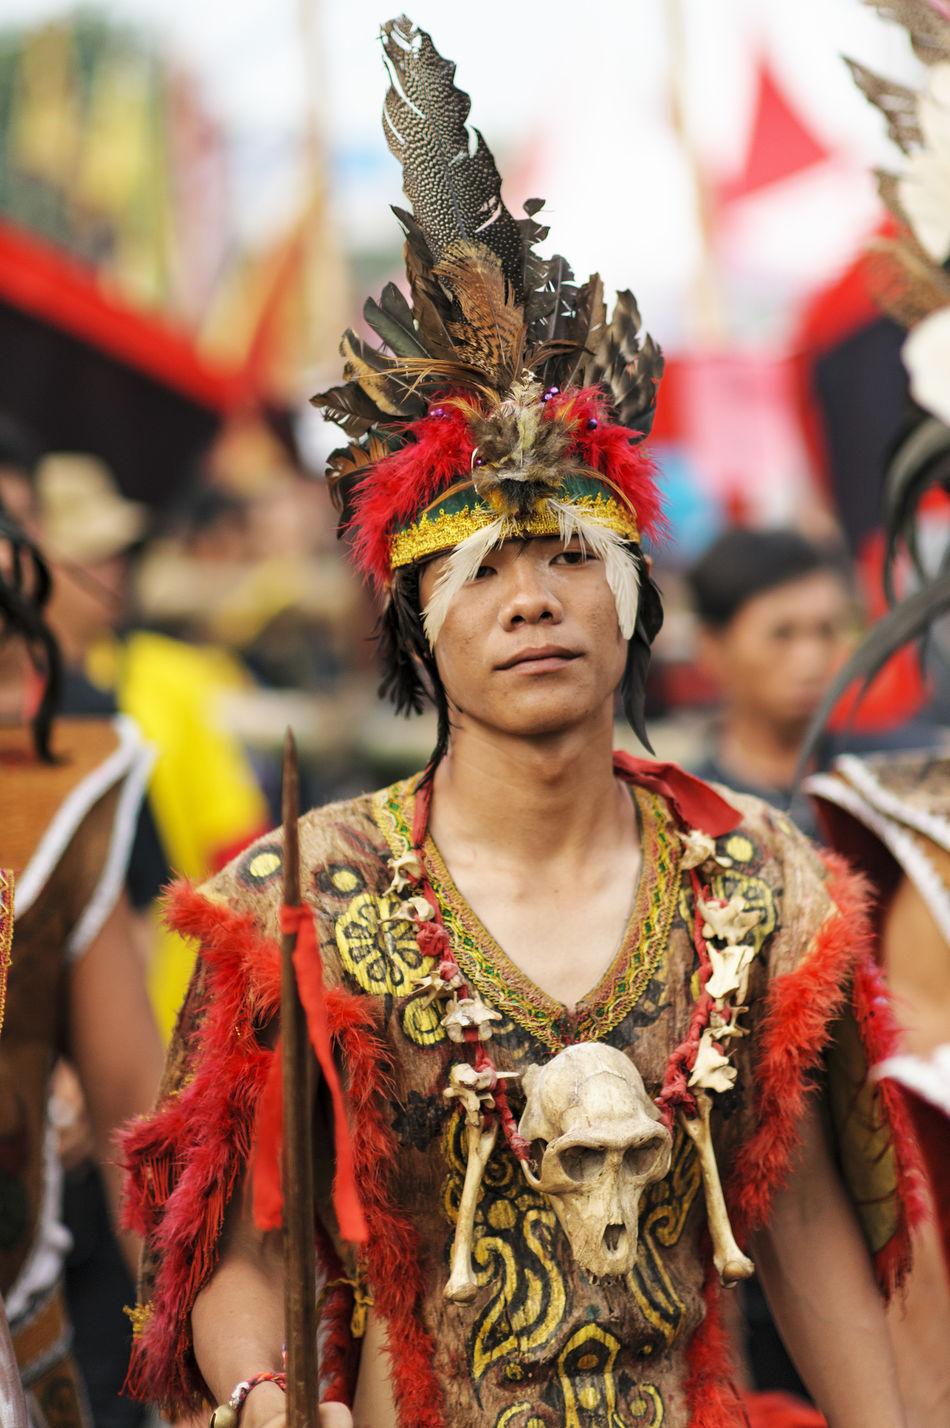 Tatung Singkawang Parade during Chap Goh Meh festival. Borneo Chap Goh Meh Chap Goh Mei Dayak Kalimantan Barat  Parade Pontianak Ritual Rituals & Cultural Singkawang Tatung Traditional Traditional Clothing Traditional Costume Traditional Culture